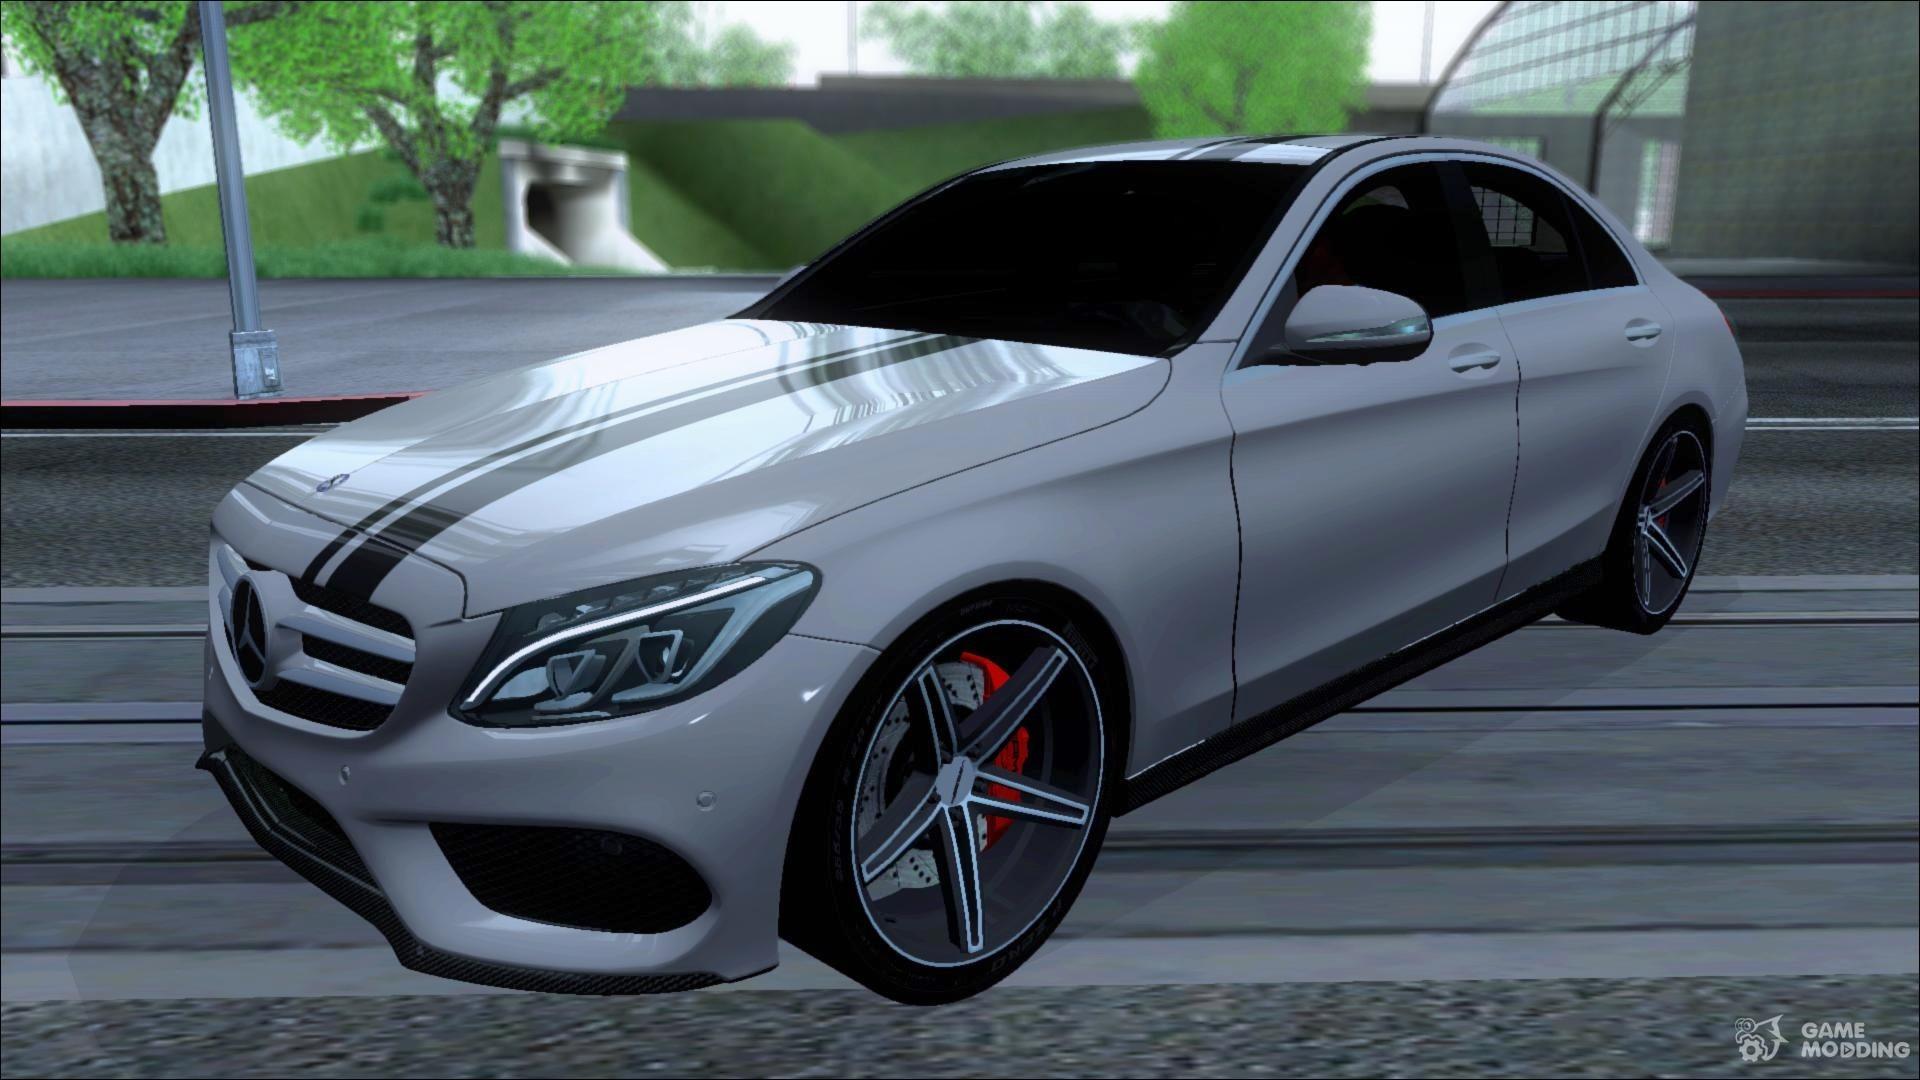 MercedesBenz C250 AMG Edition V 10 2014 for GTA San Andreas